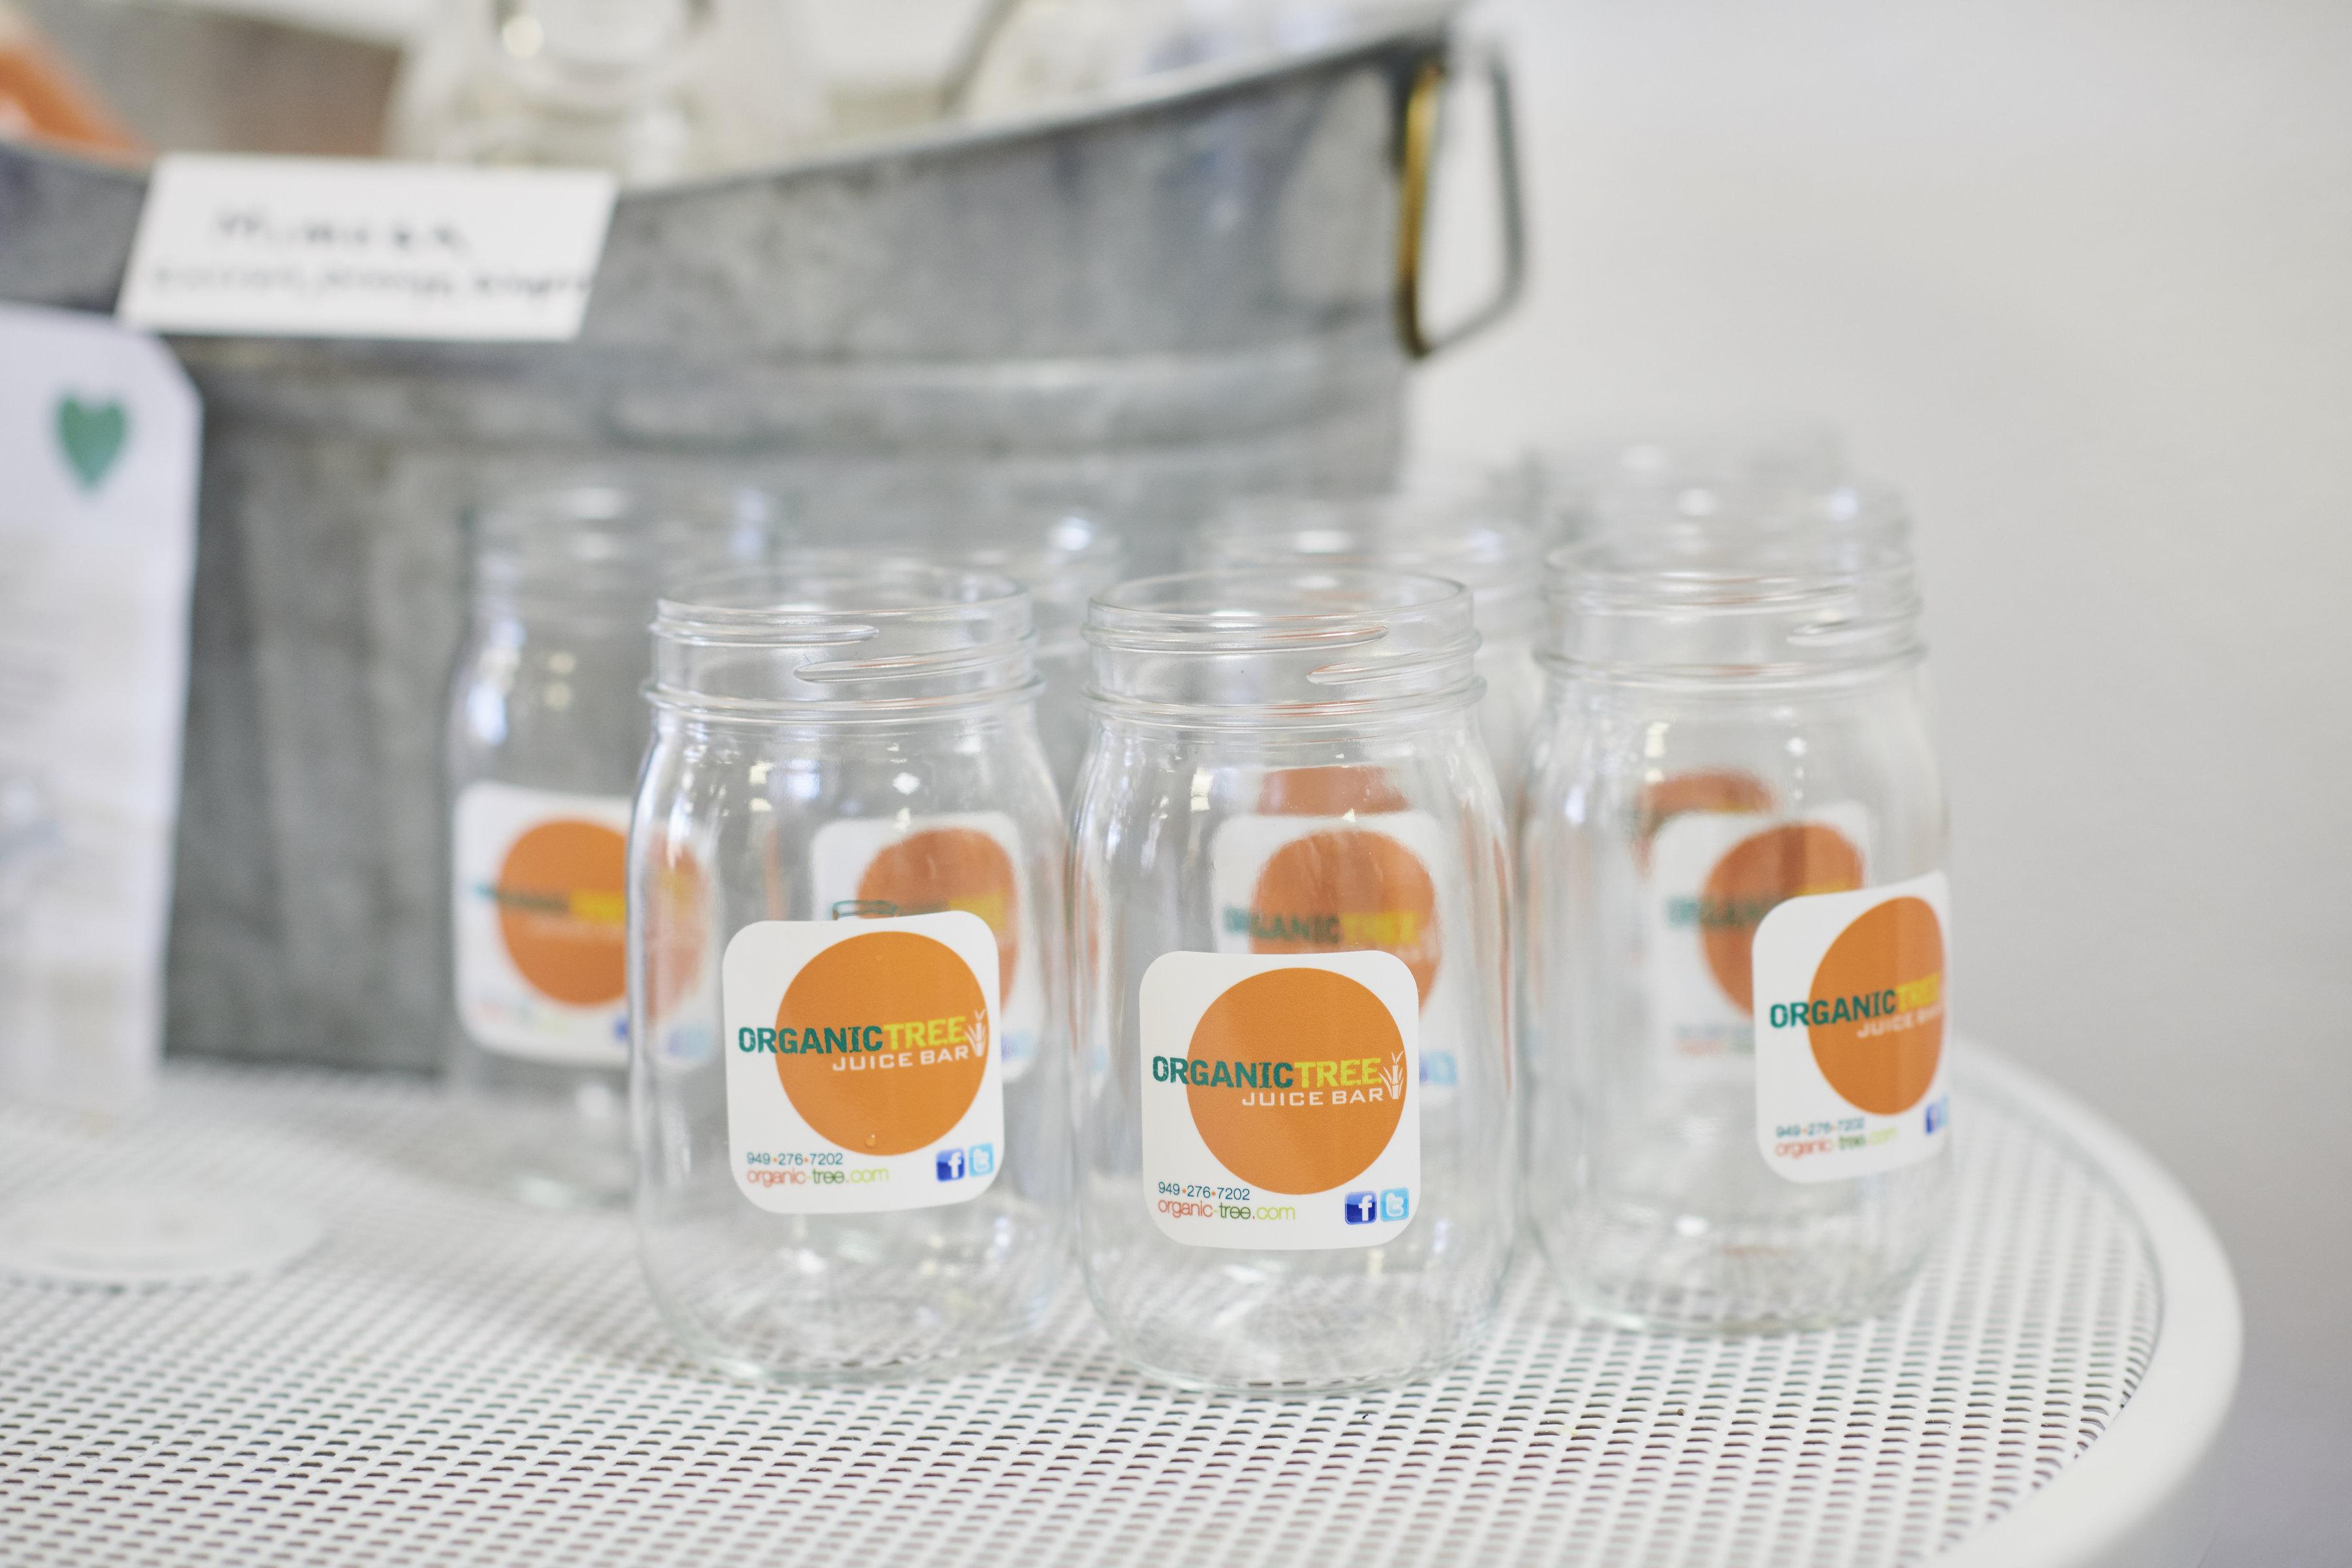 organic tree dana point jars